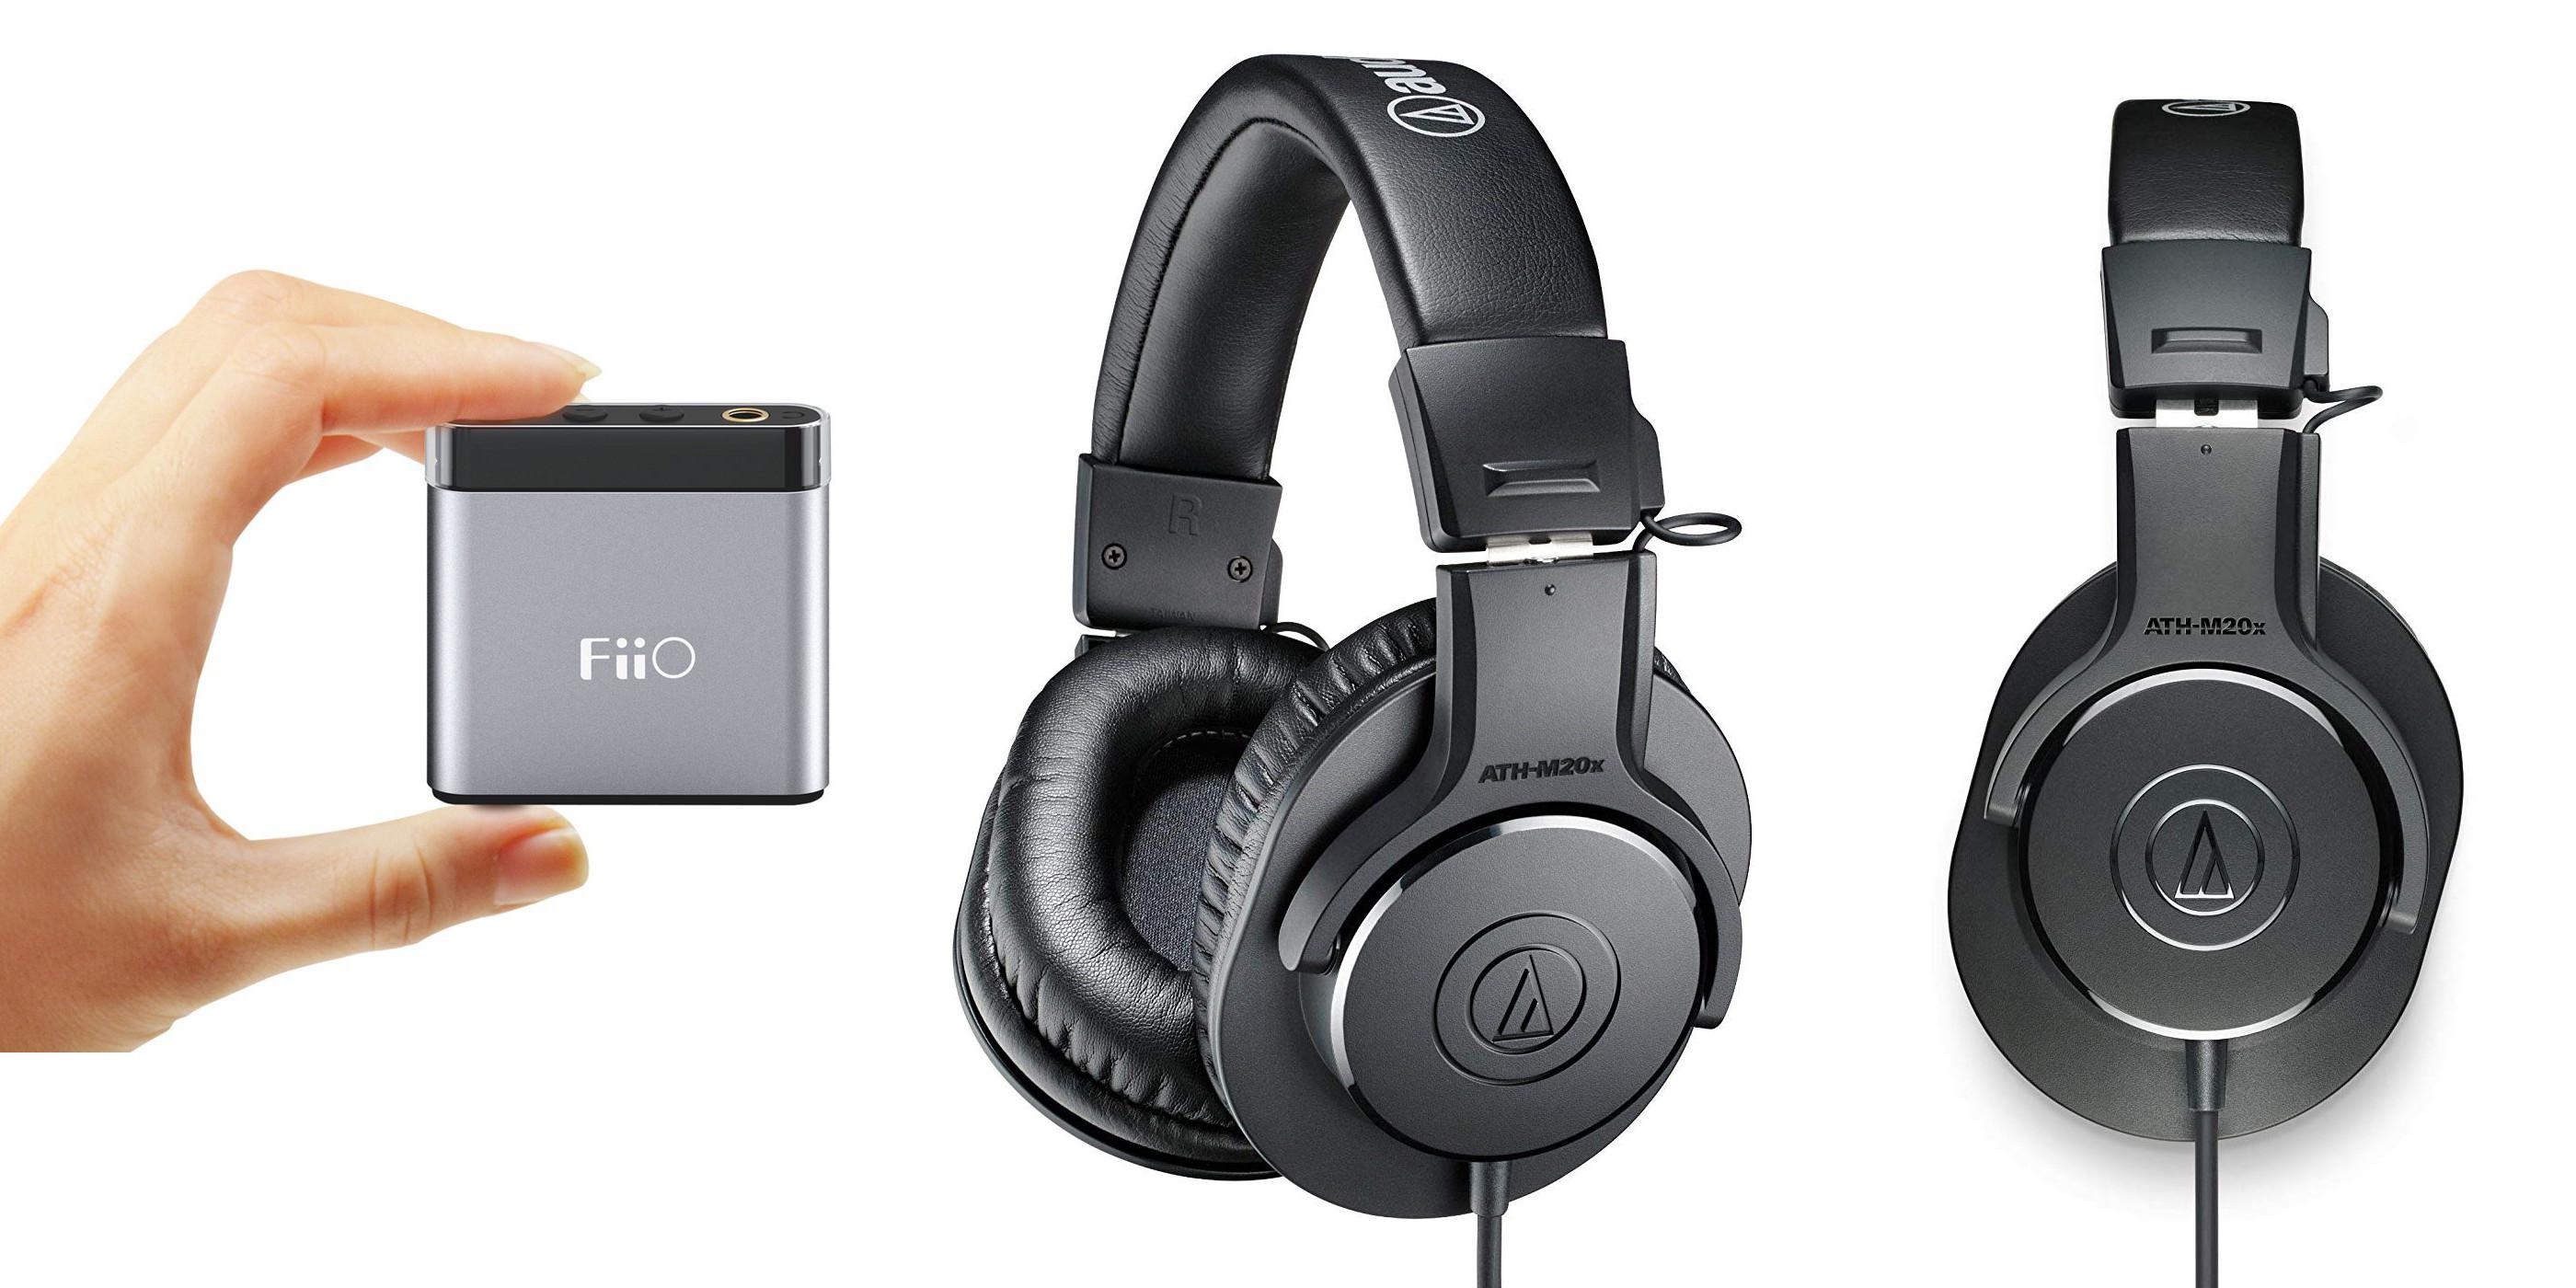 24de2a26f0b Audio-Technica's ATH-M20x Pro Headphones + a FiiO A1 Amp for $54 shipped  ($78+ value), more